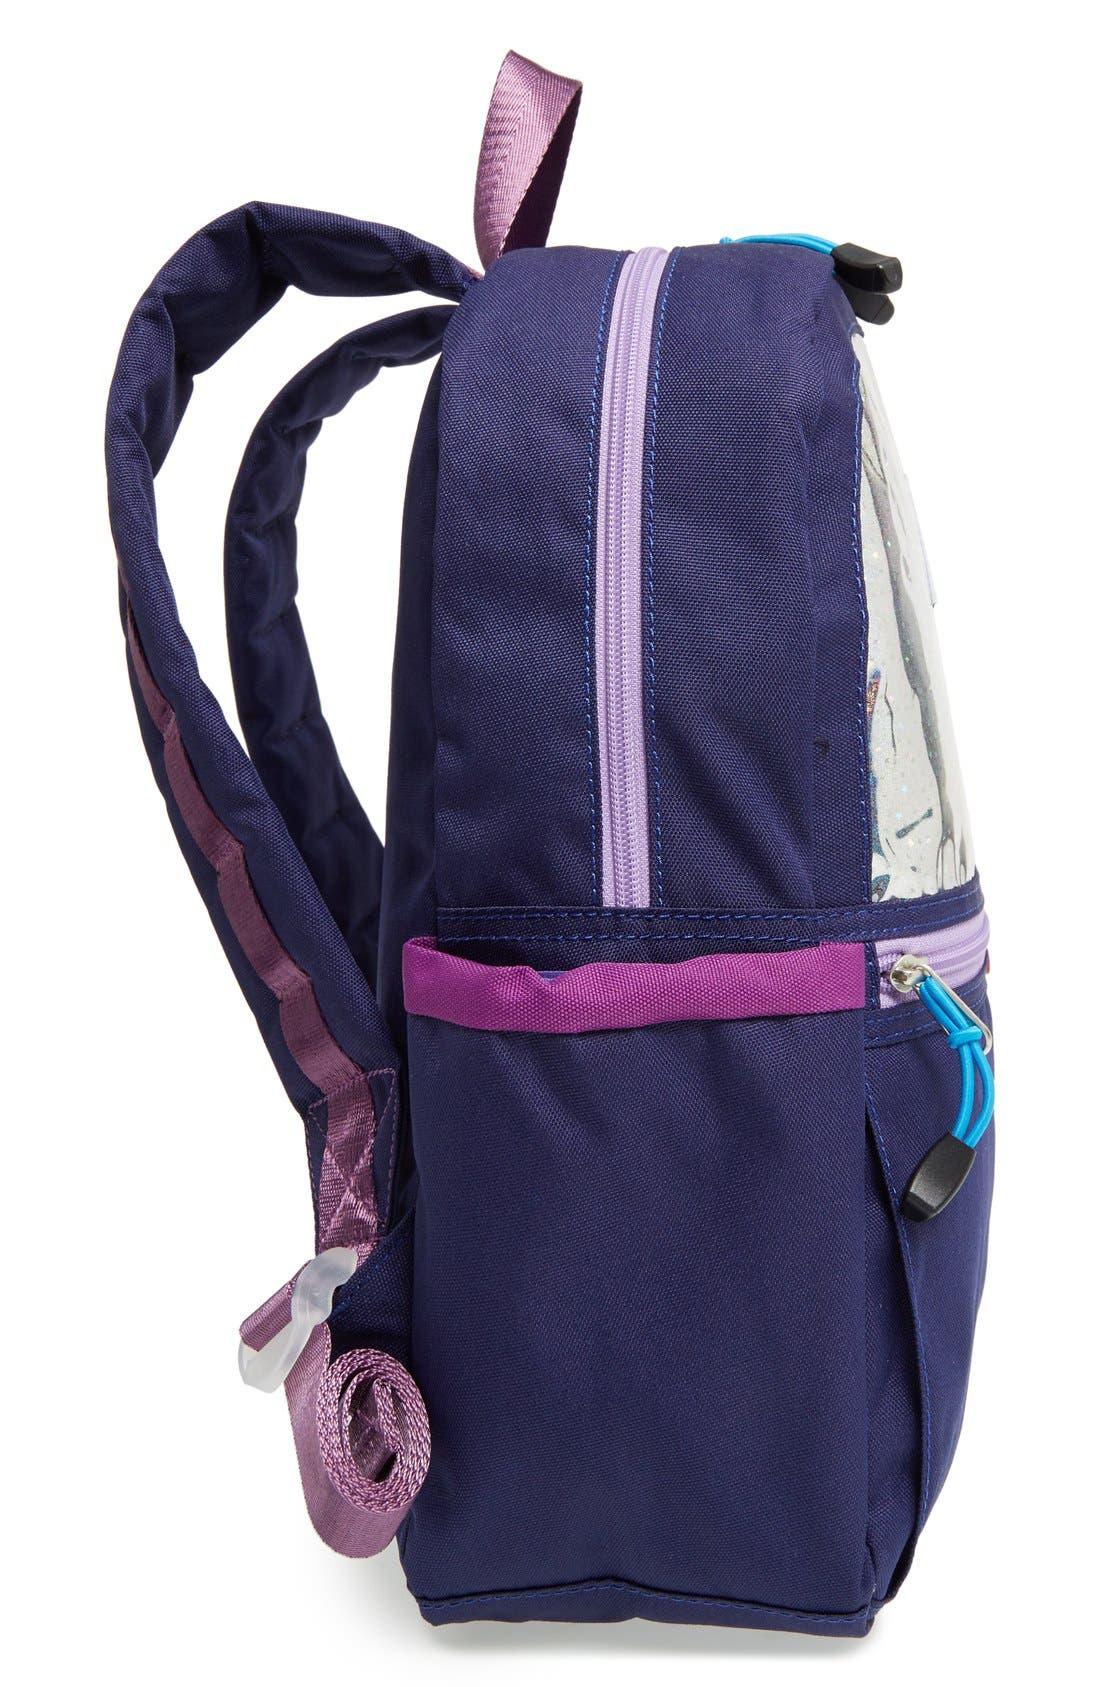 STATE BAGS,                             'Kane' Backpack,                             Alternate thumbnail 2, color,                             500